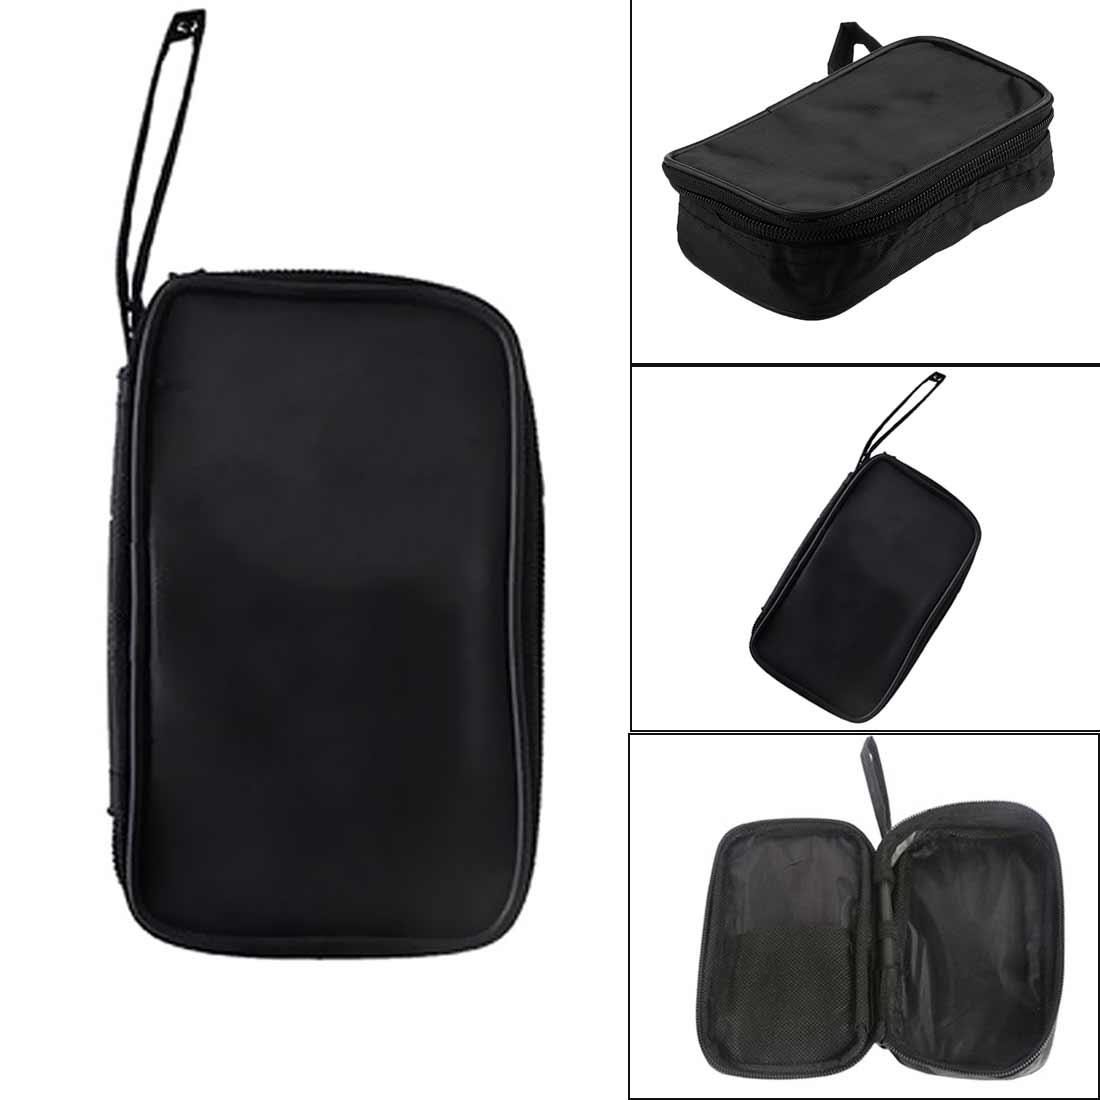 Multimeter Black Colth Bag 23x14x5cm Durable Waterproof Shockproof Soft Case